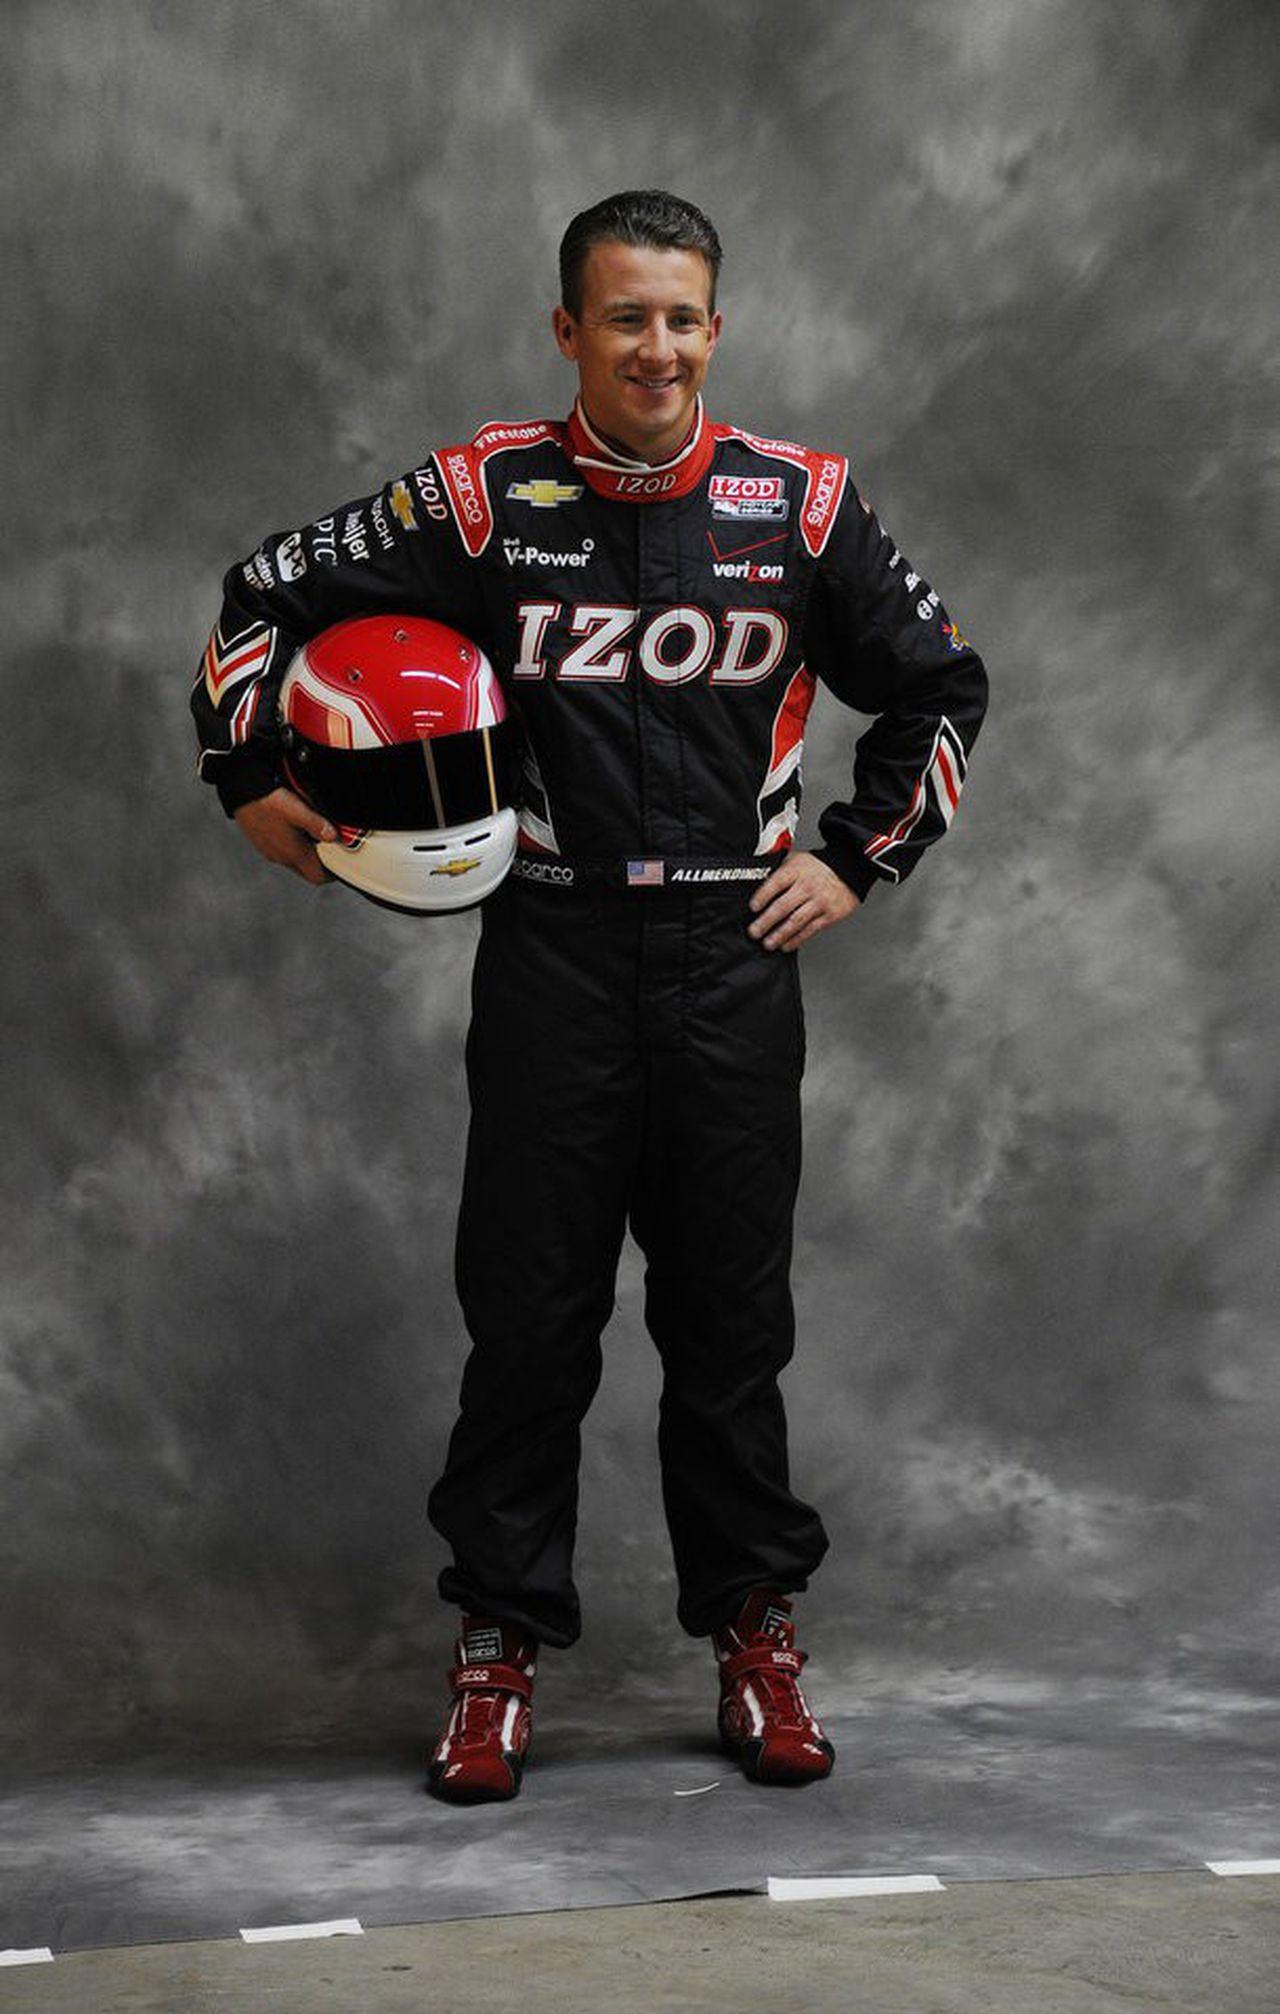 AJ ALLMENDINGER - 2012 Press Pass Ignite NASCAR Racing Firesuit Card